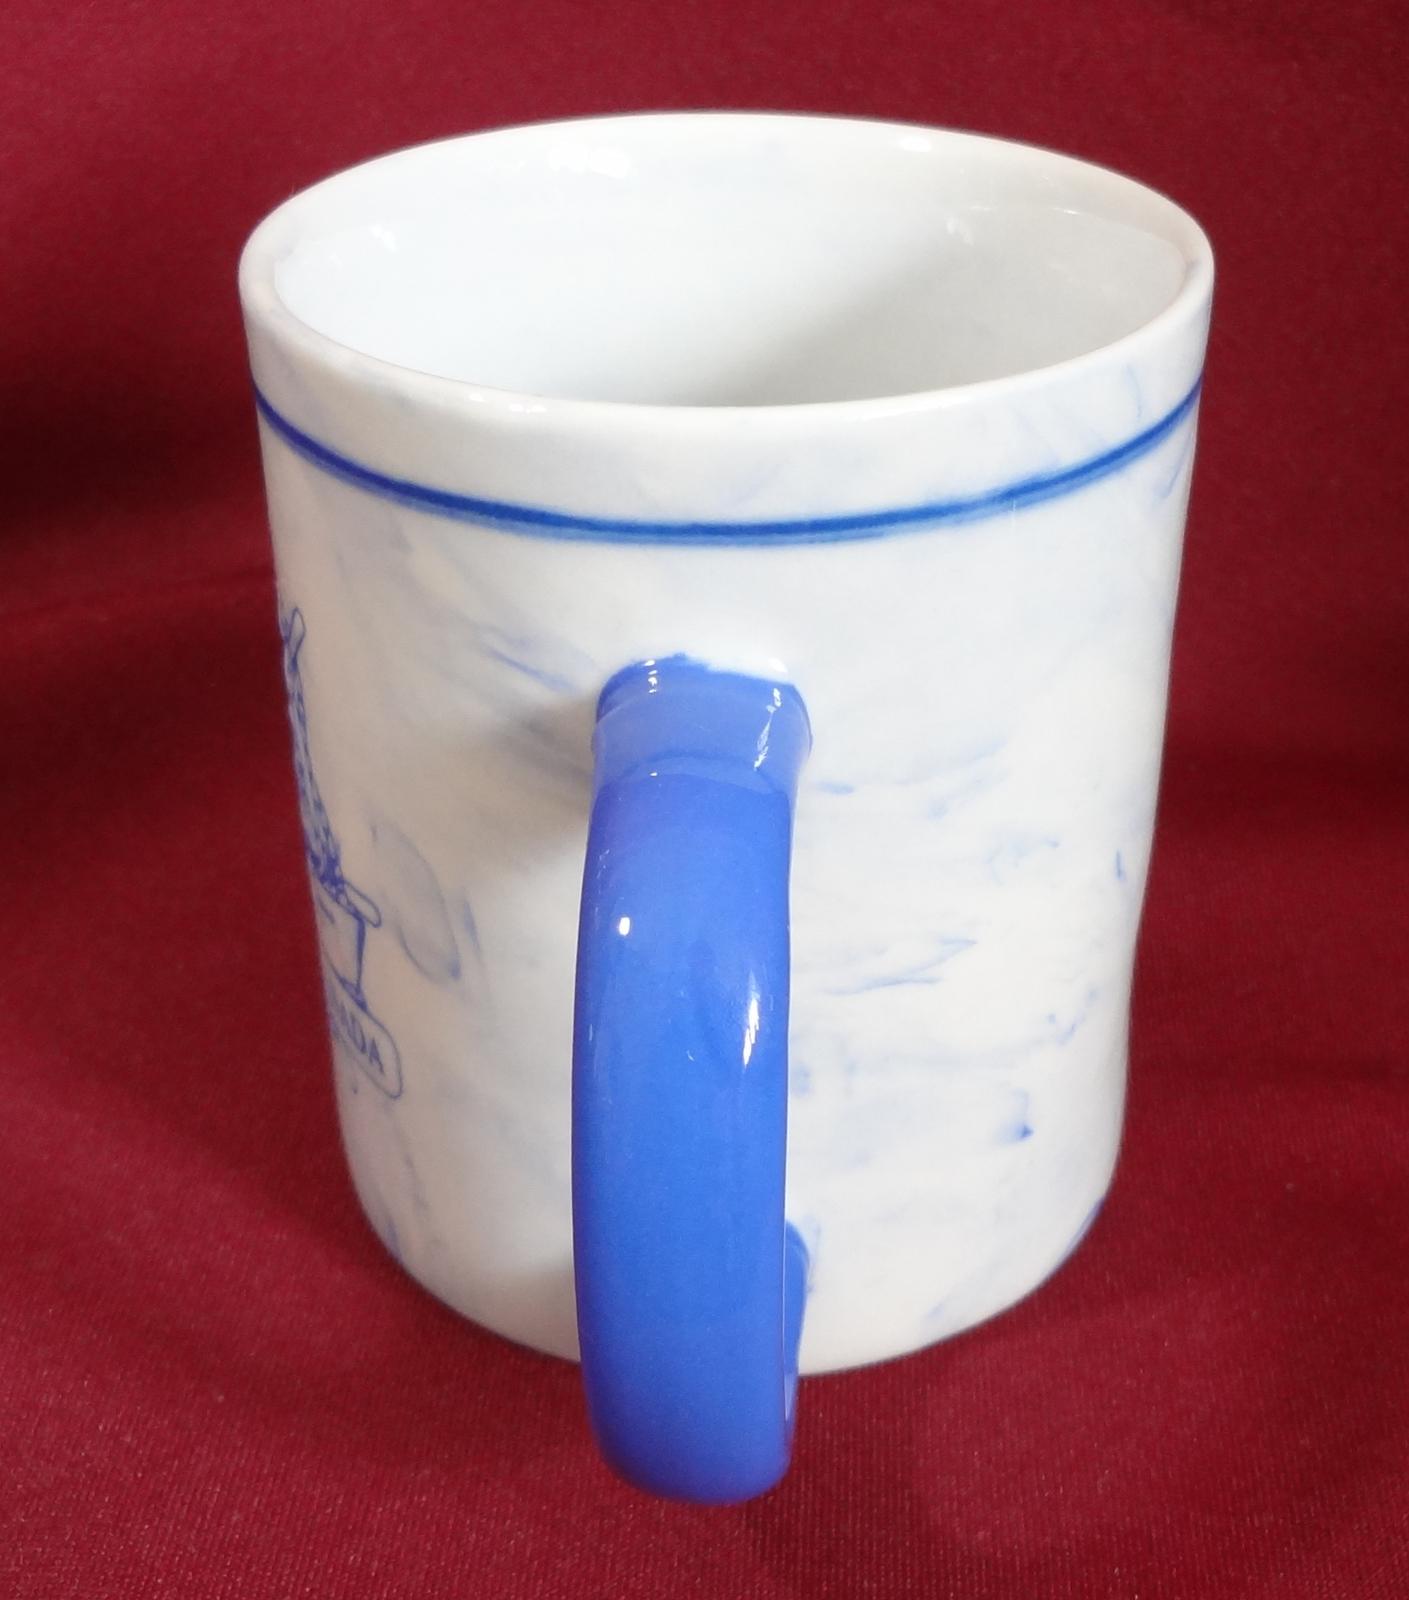 Niagara Falls Canada Maid of the Mist 10 oz Souvenir Coffee Mug Cup